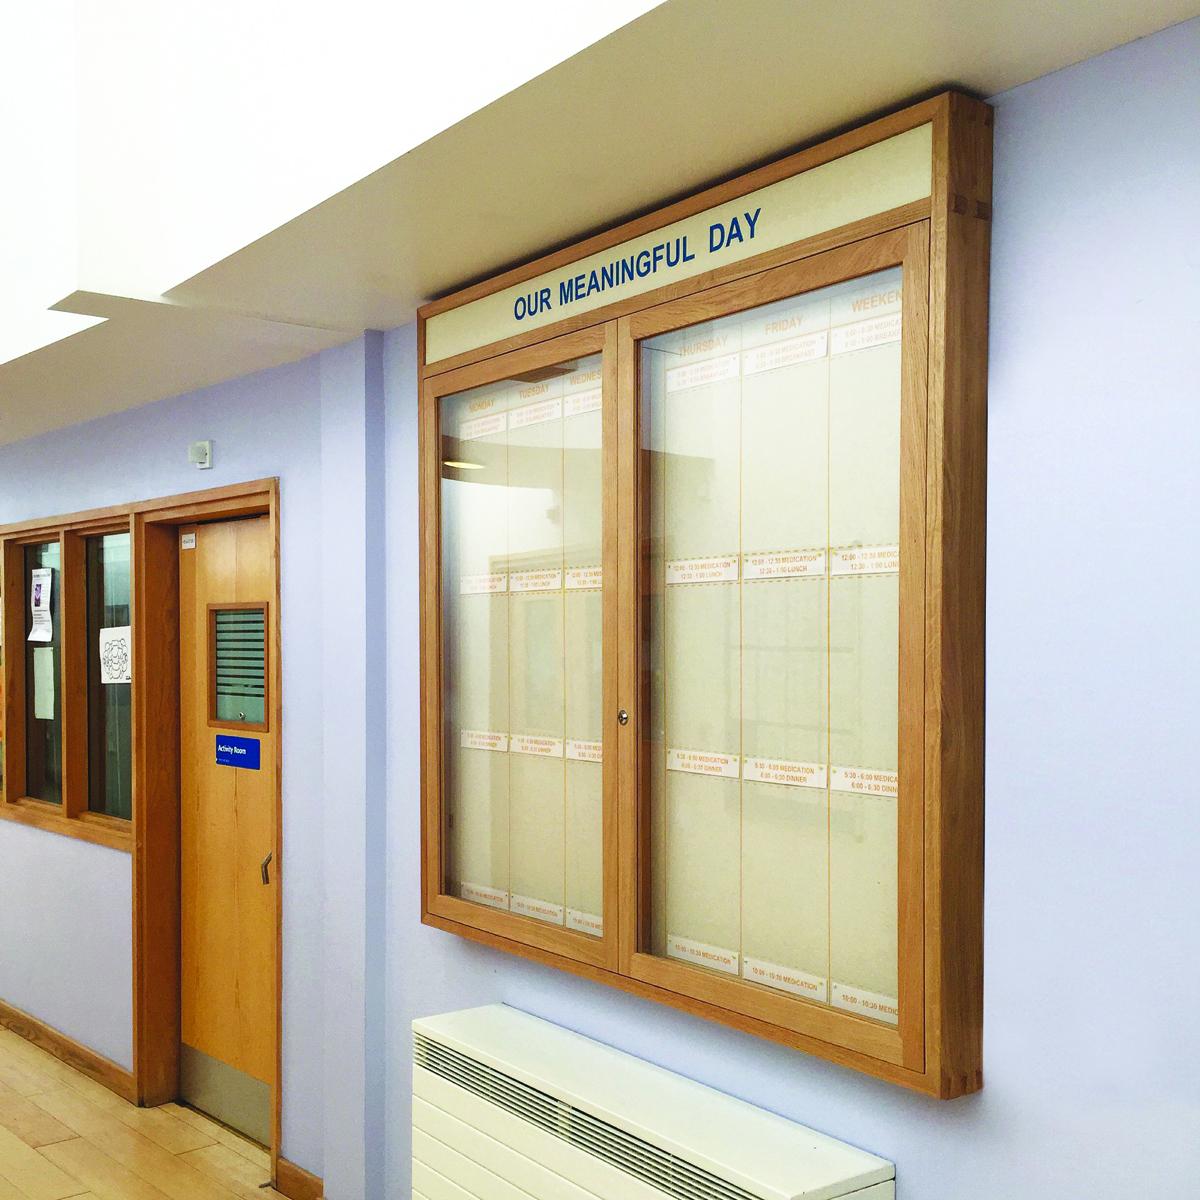 Assemble_Hallway_Noticeboard_3